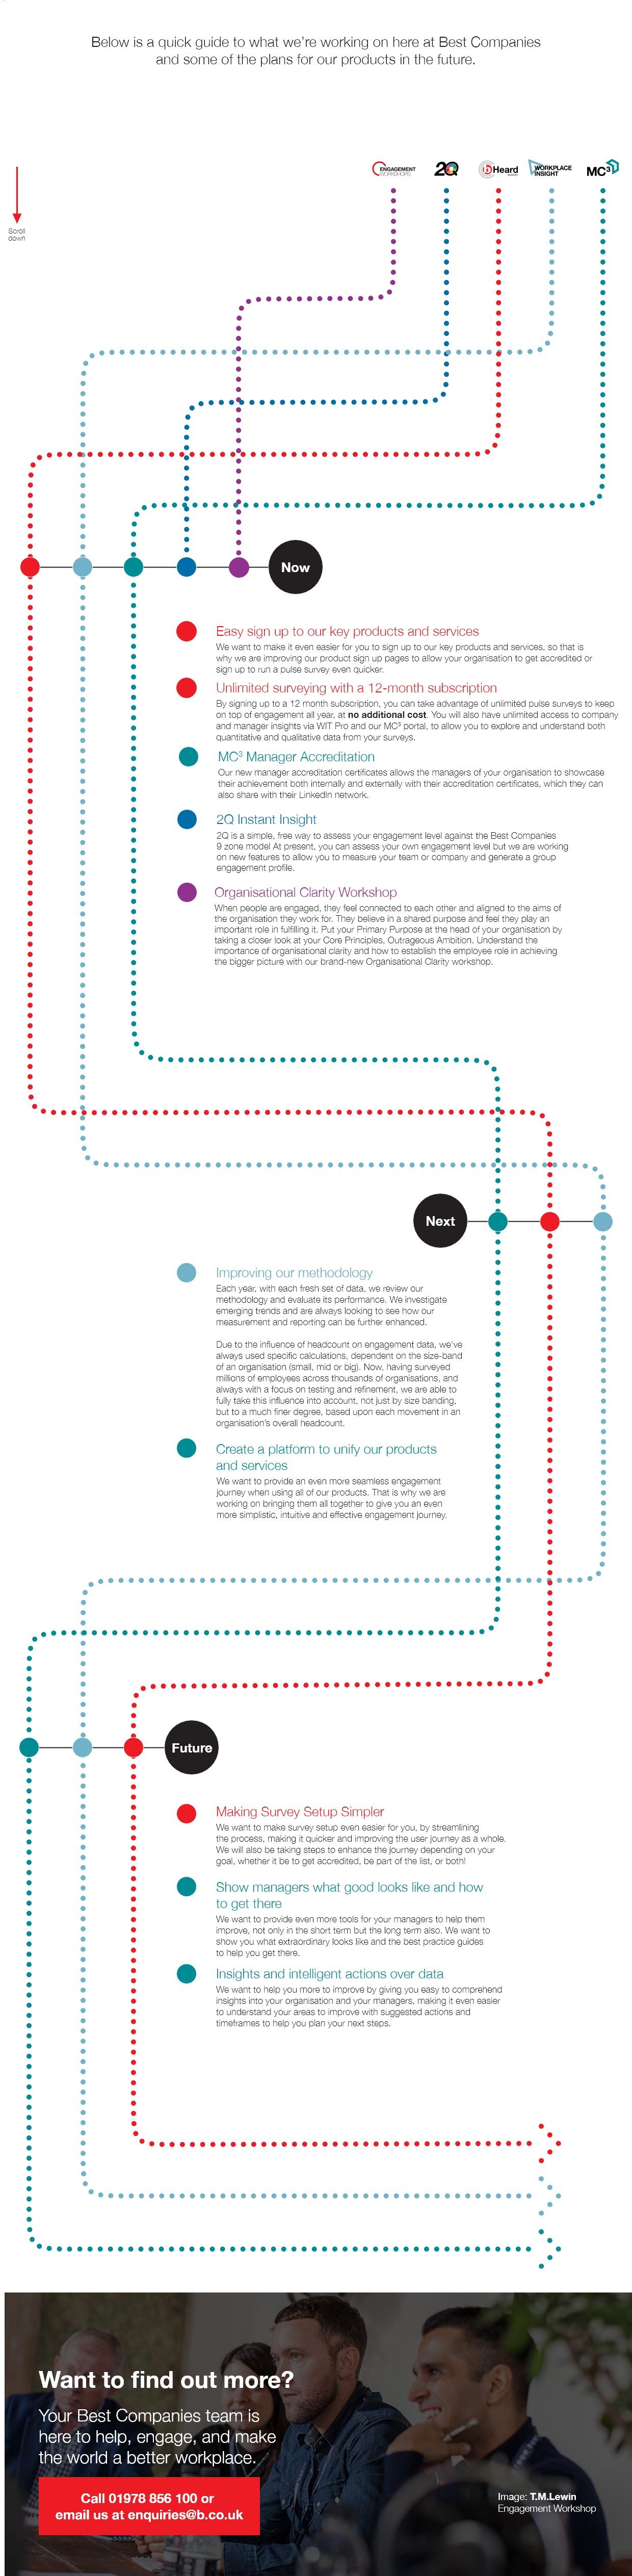 Best Companies 2020 Product Roadmap - Q3